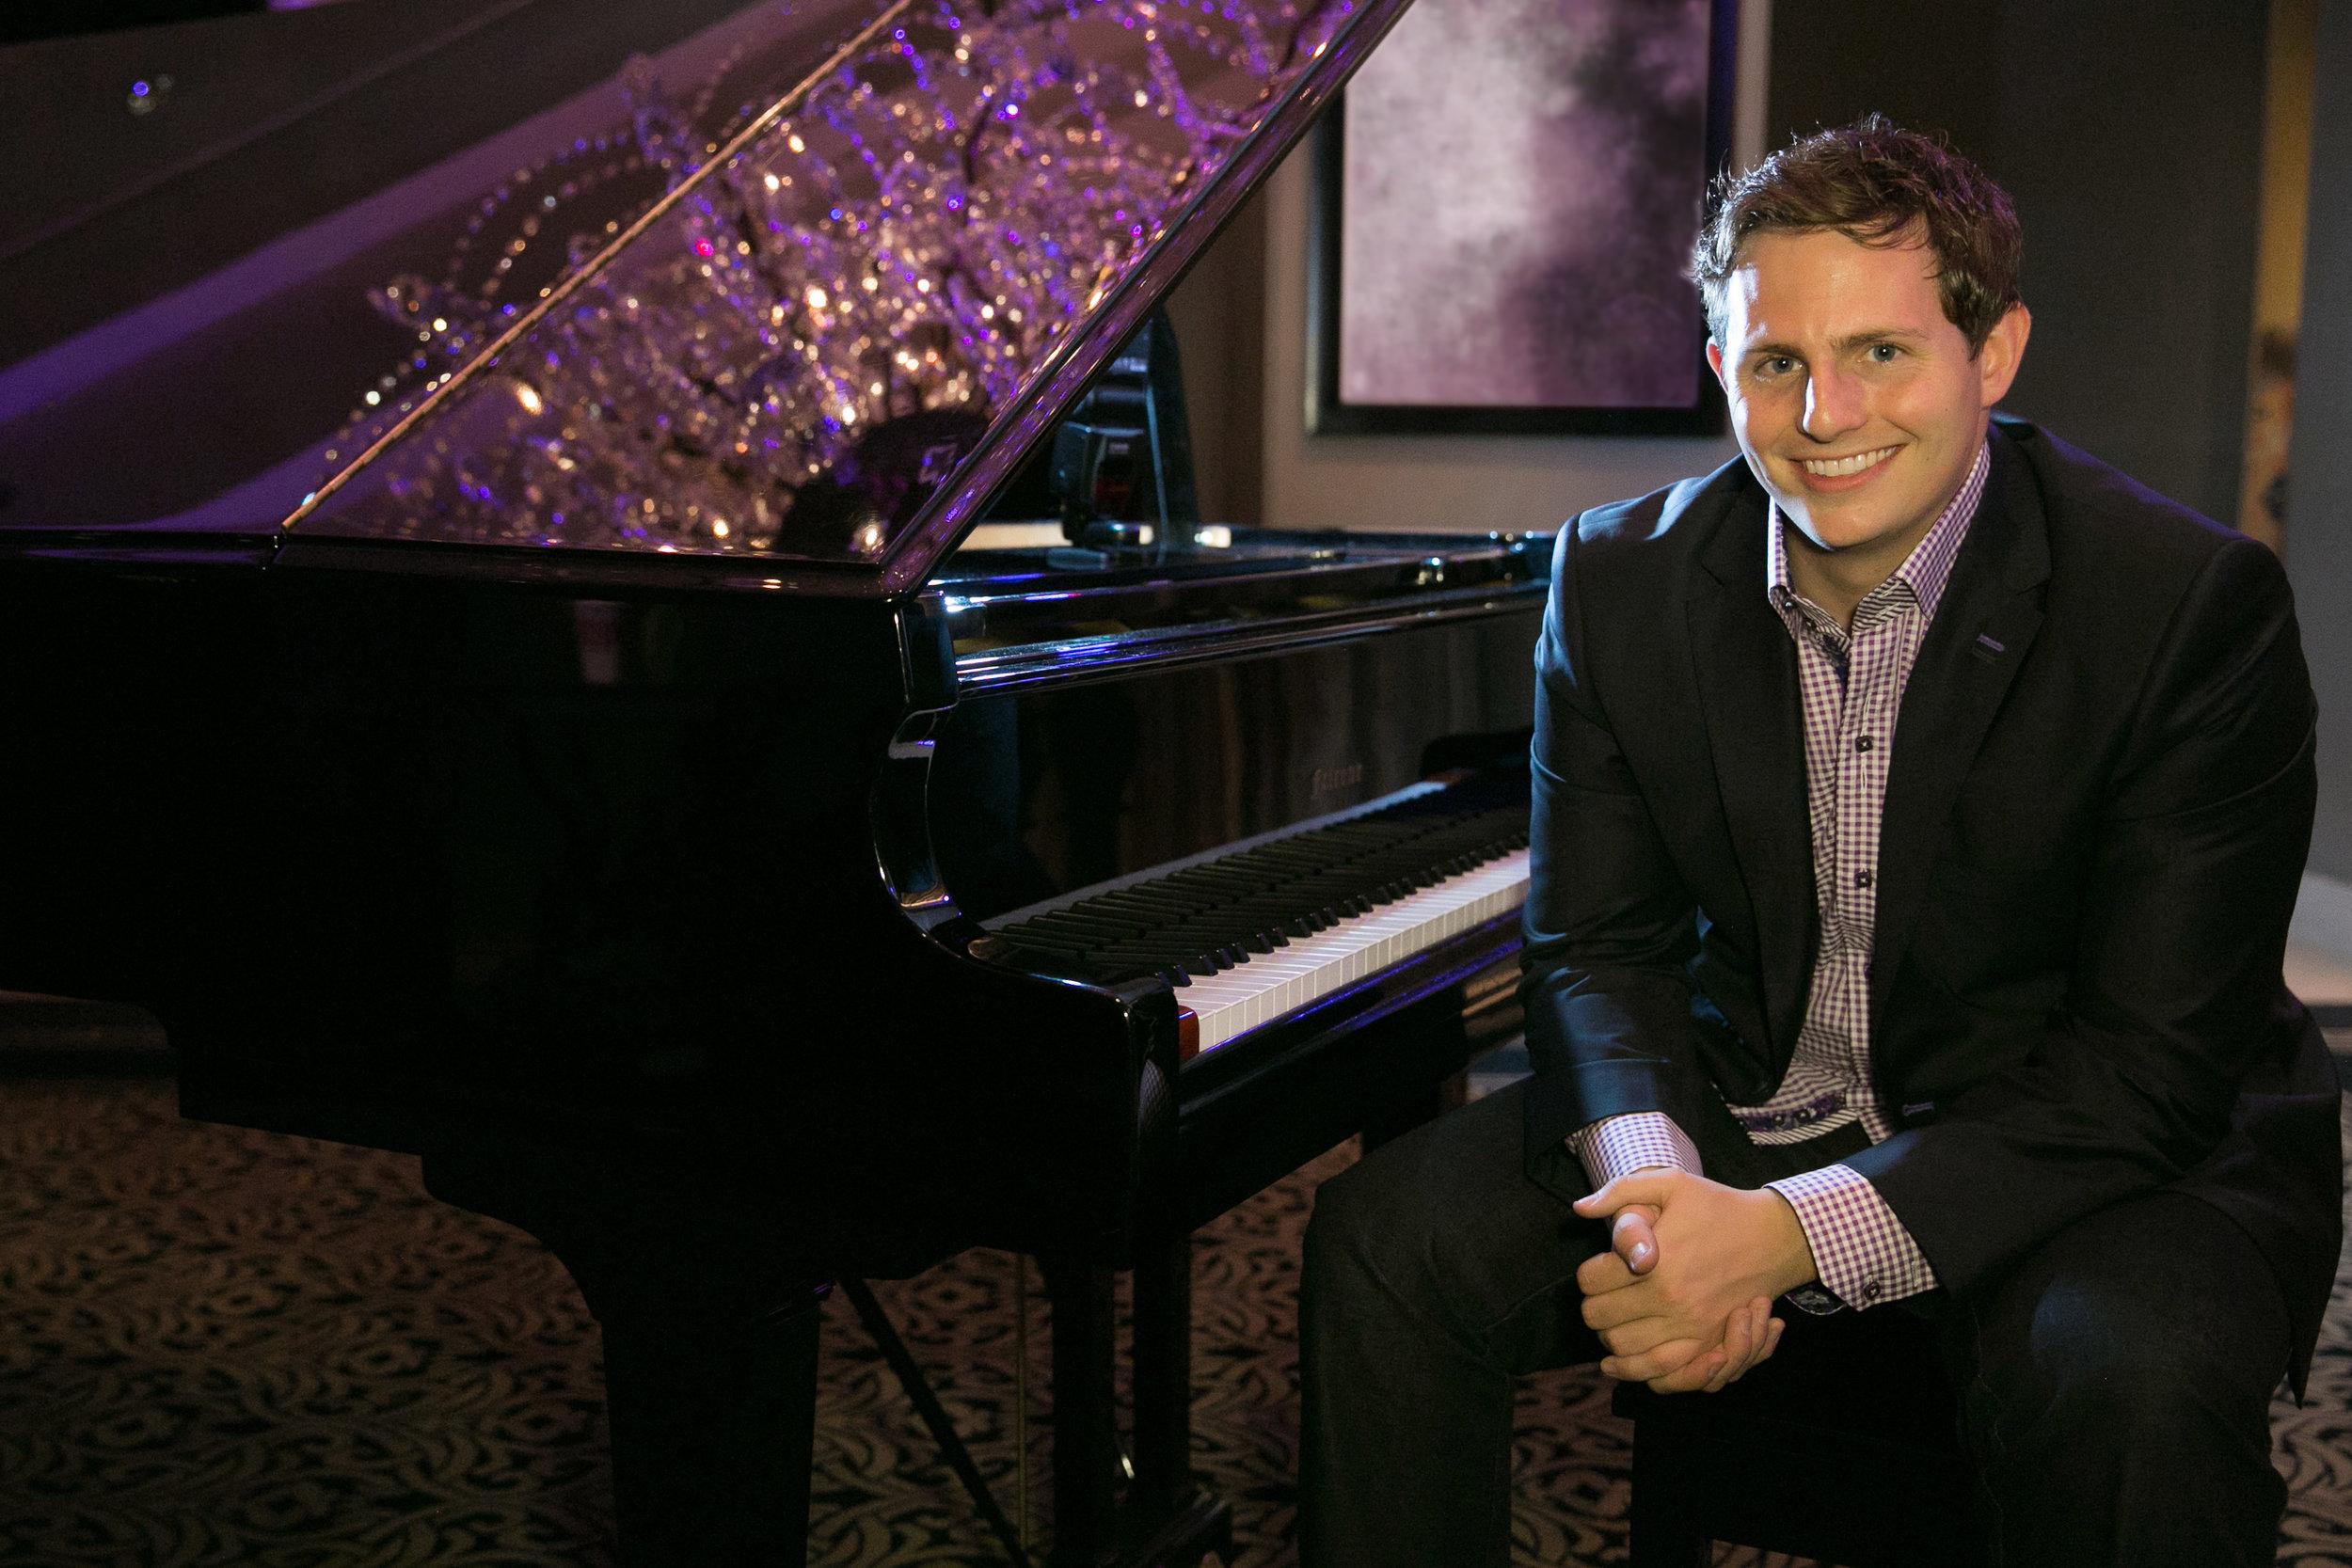 Smiling Piano Photo Edit.jpg